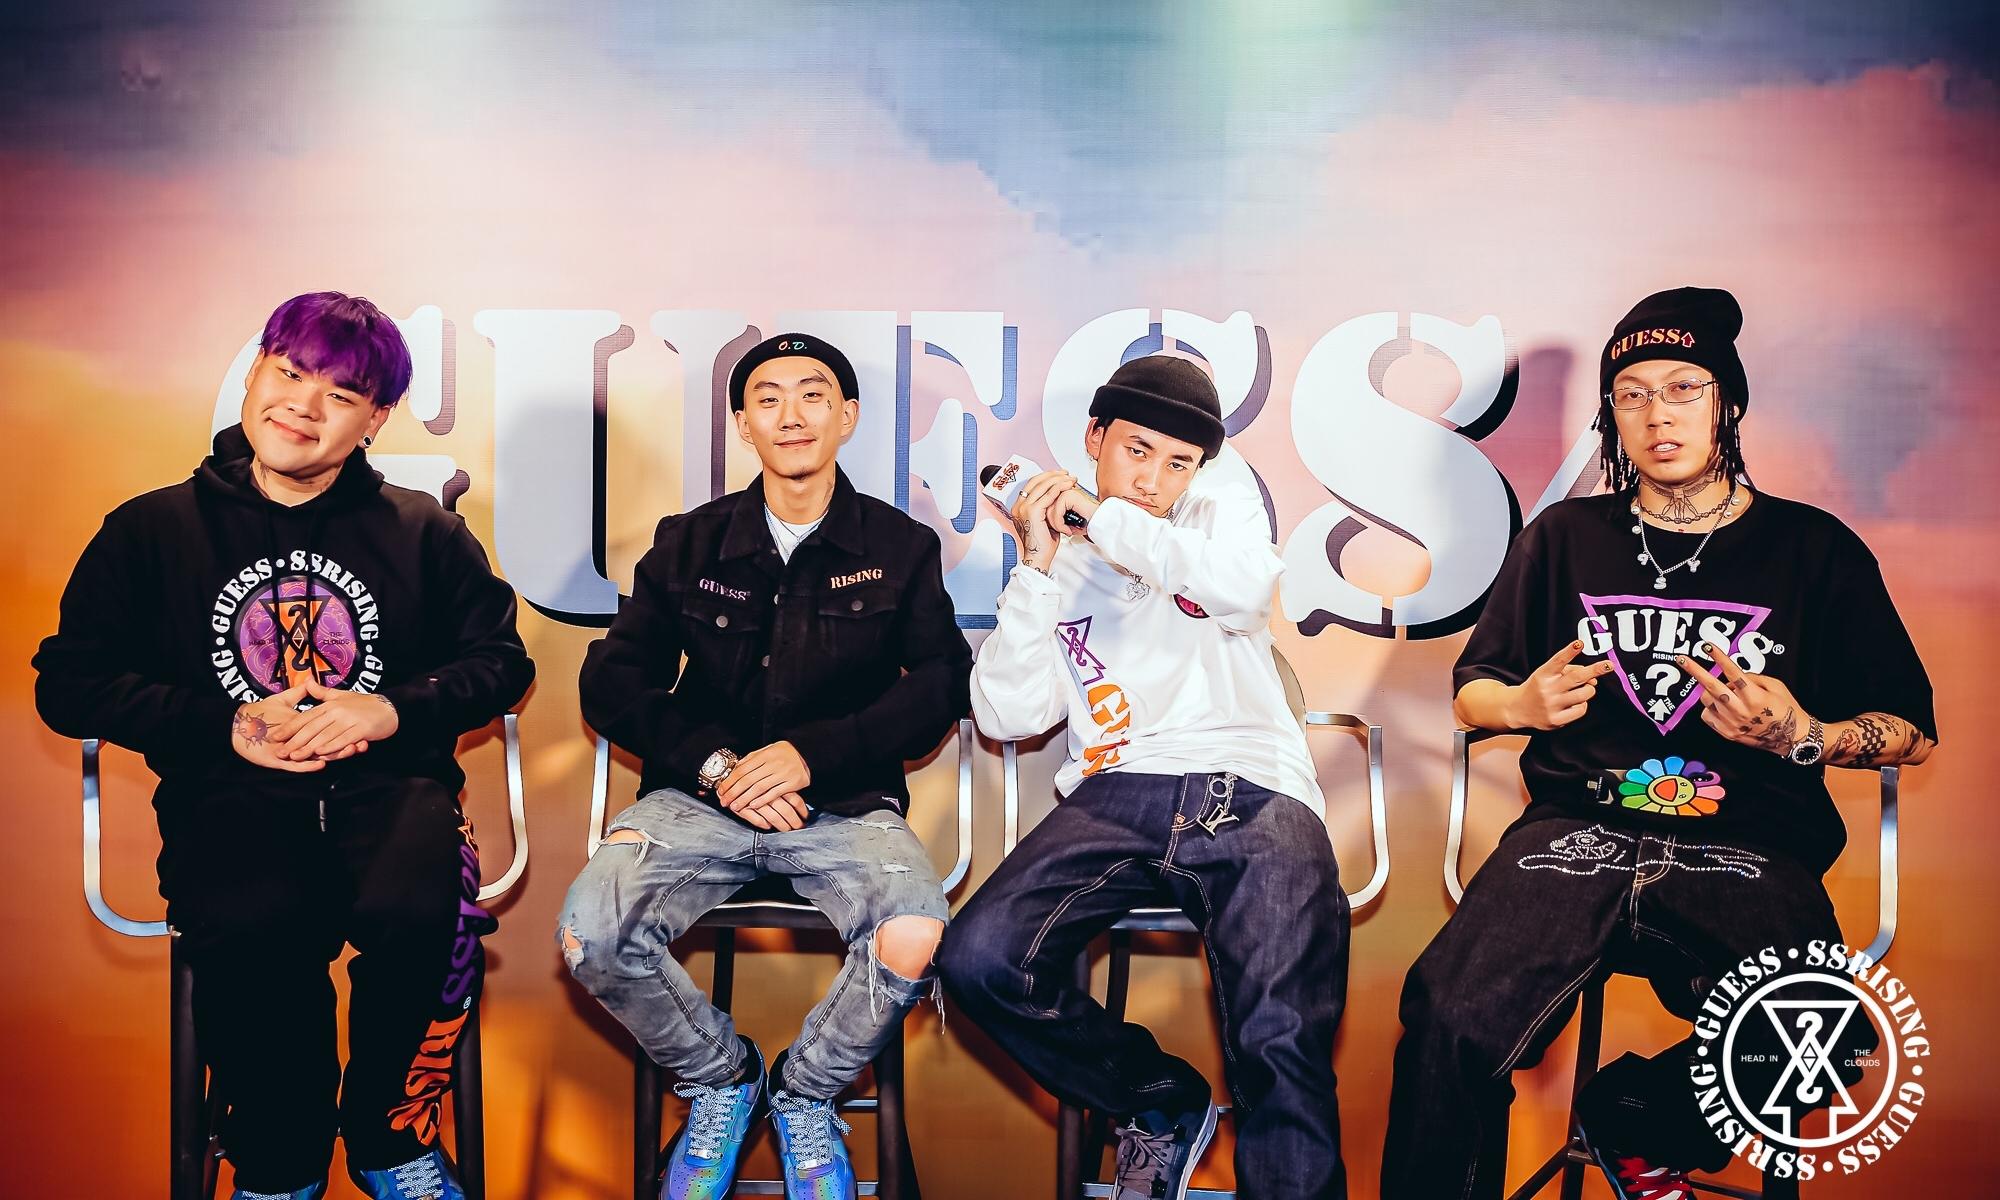 GUESS x 88RISING 胶囊系列新品媒体预览会于上海举办